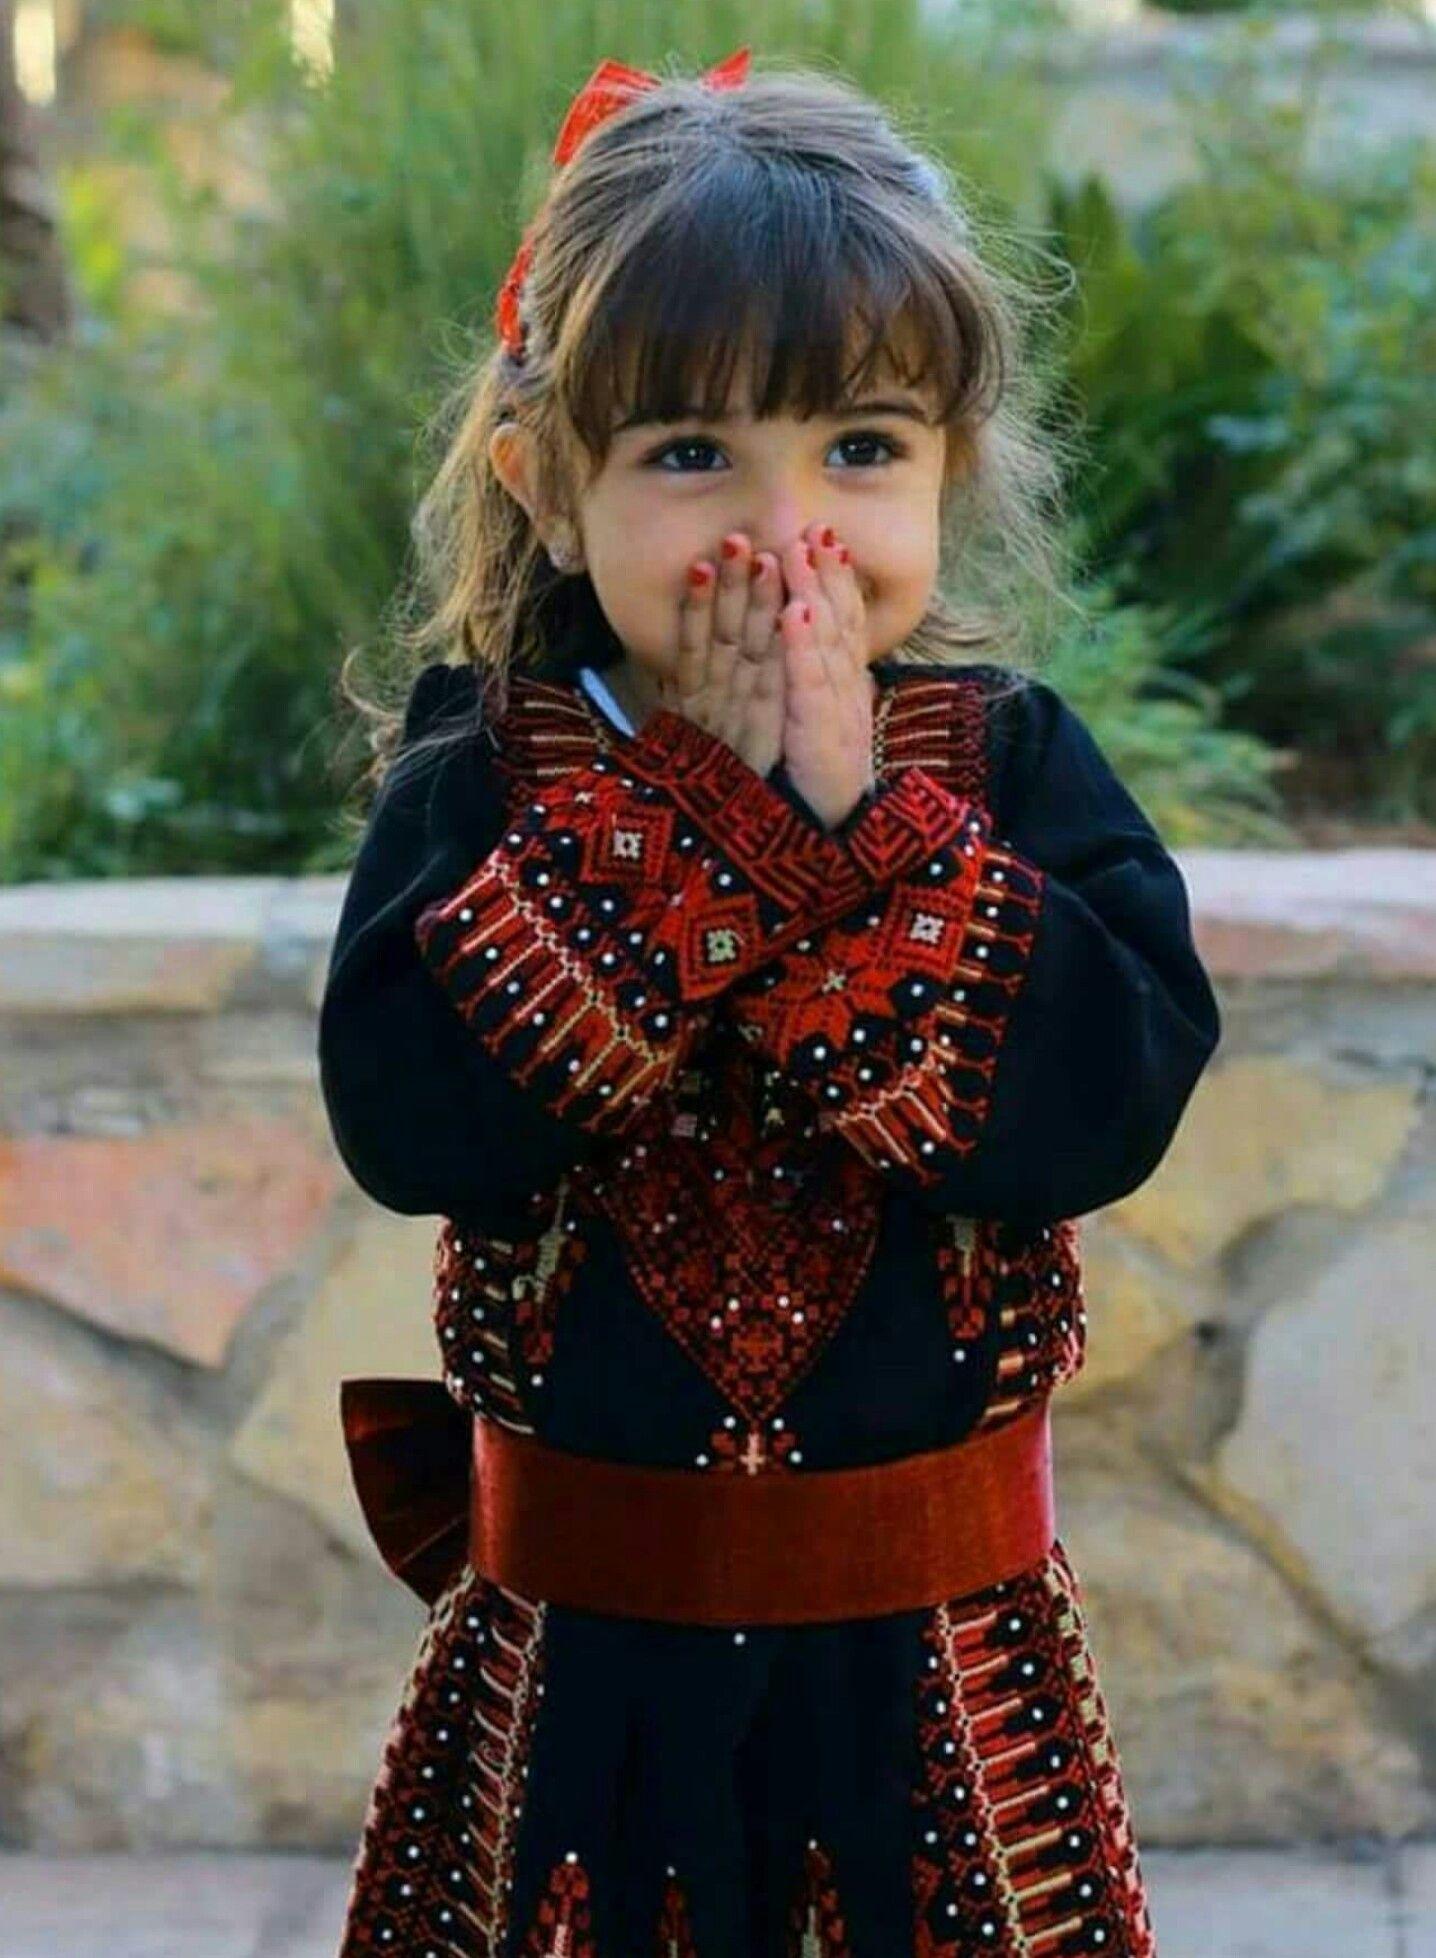 Pin by Nadia Al on Palestine فلسطين | Traditional dresses ...